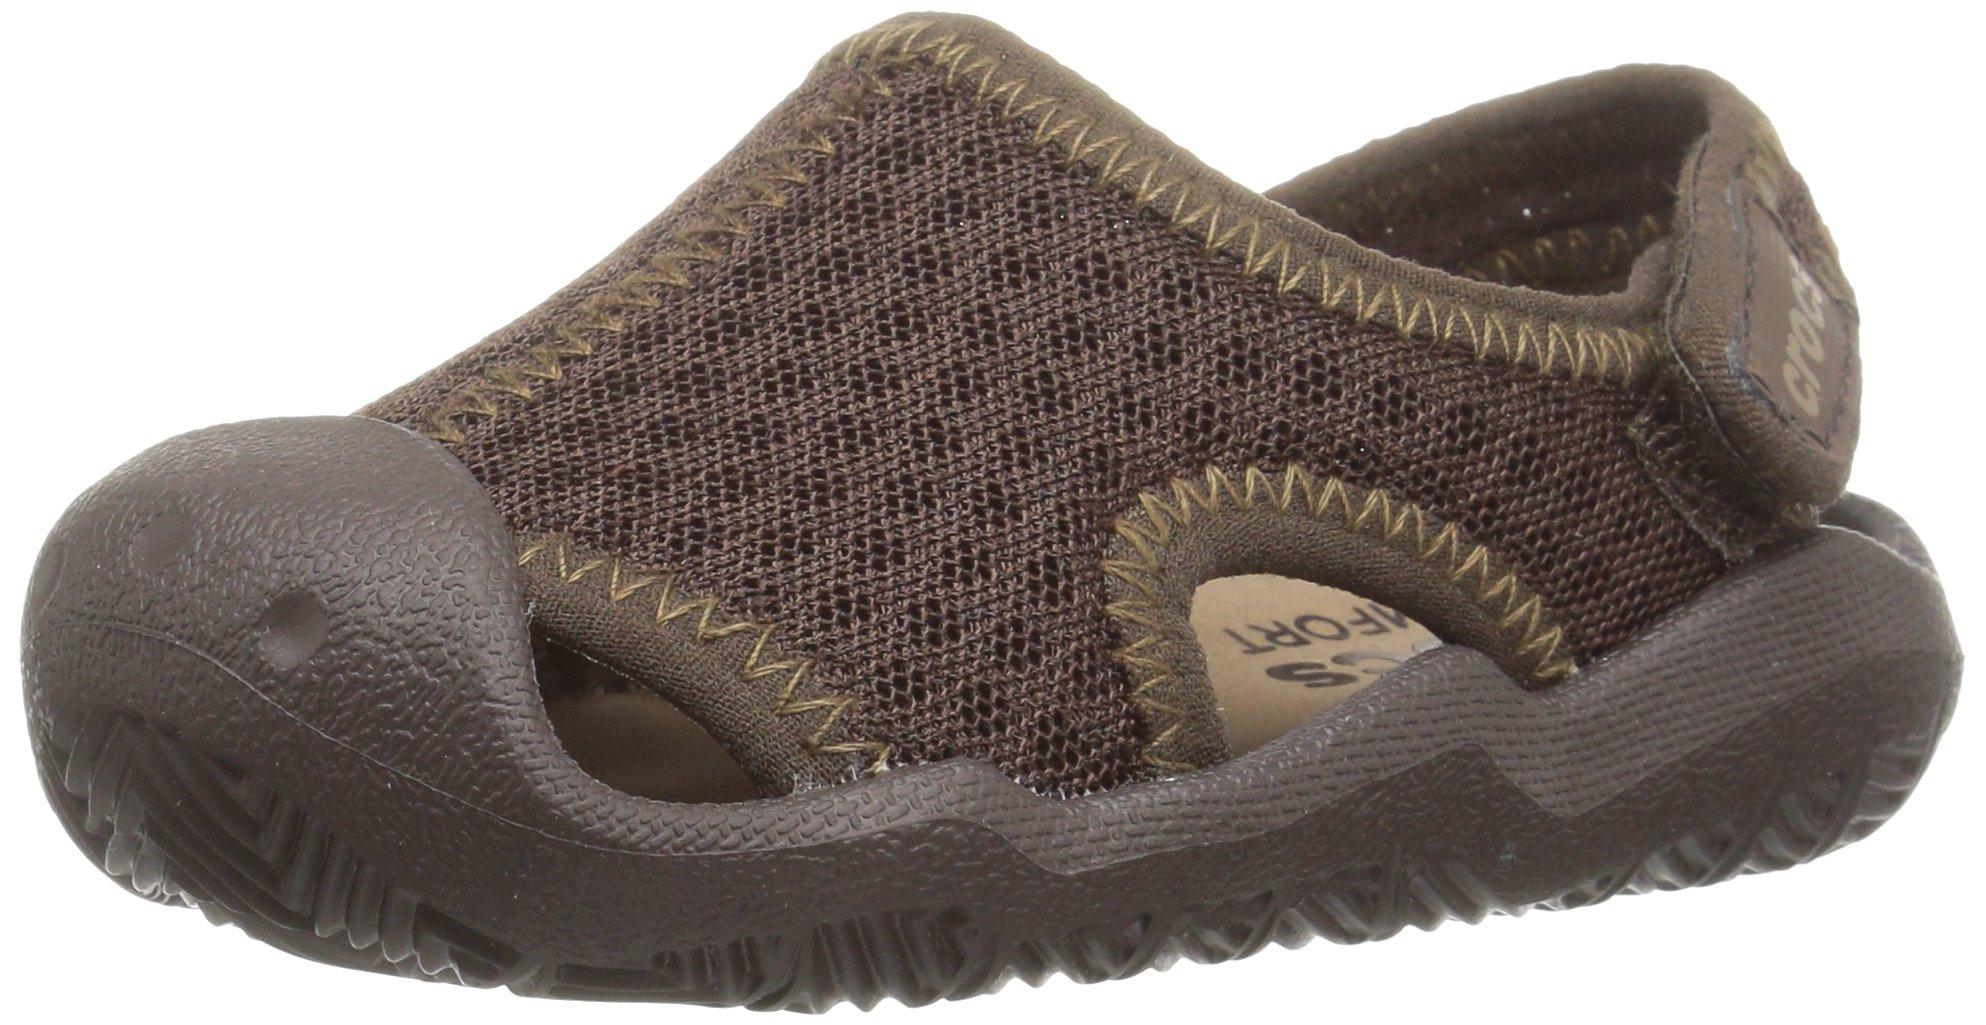 Crocs Kids' Swiftwater Sandal,Espresso/Khaki,10 M US Toddler